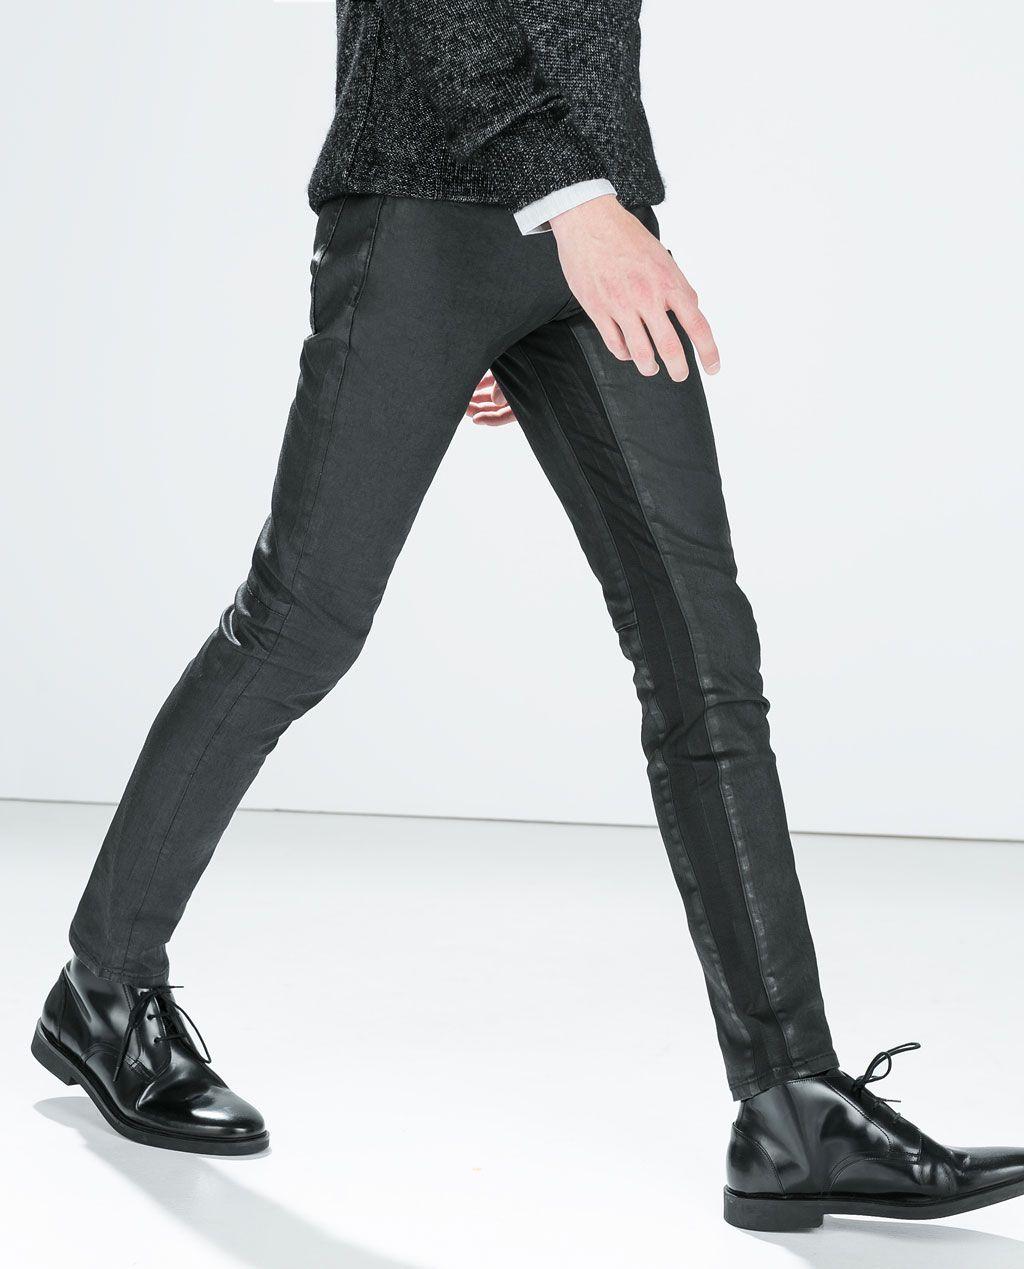 Imagen Negro Pantalón De Zara 3 Coated Piezas Punto rcS8rpWq